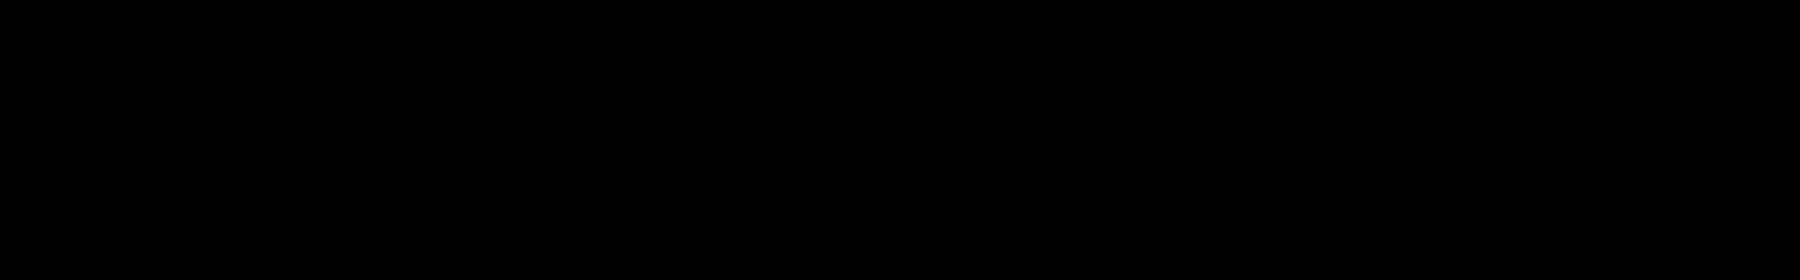 Lo-Fi Element - Lo-Fi Mode audio waveform